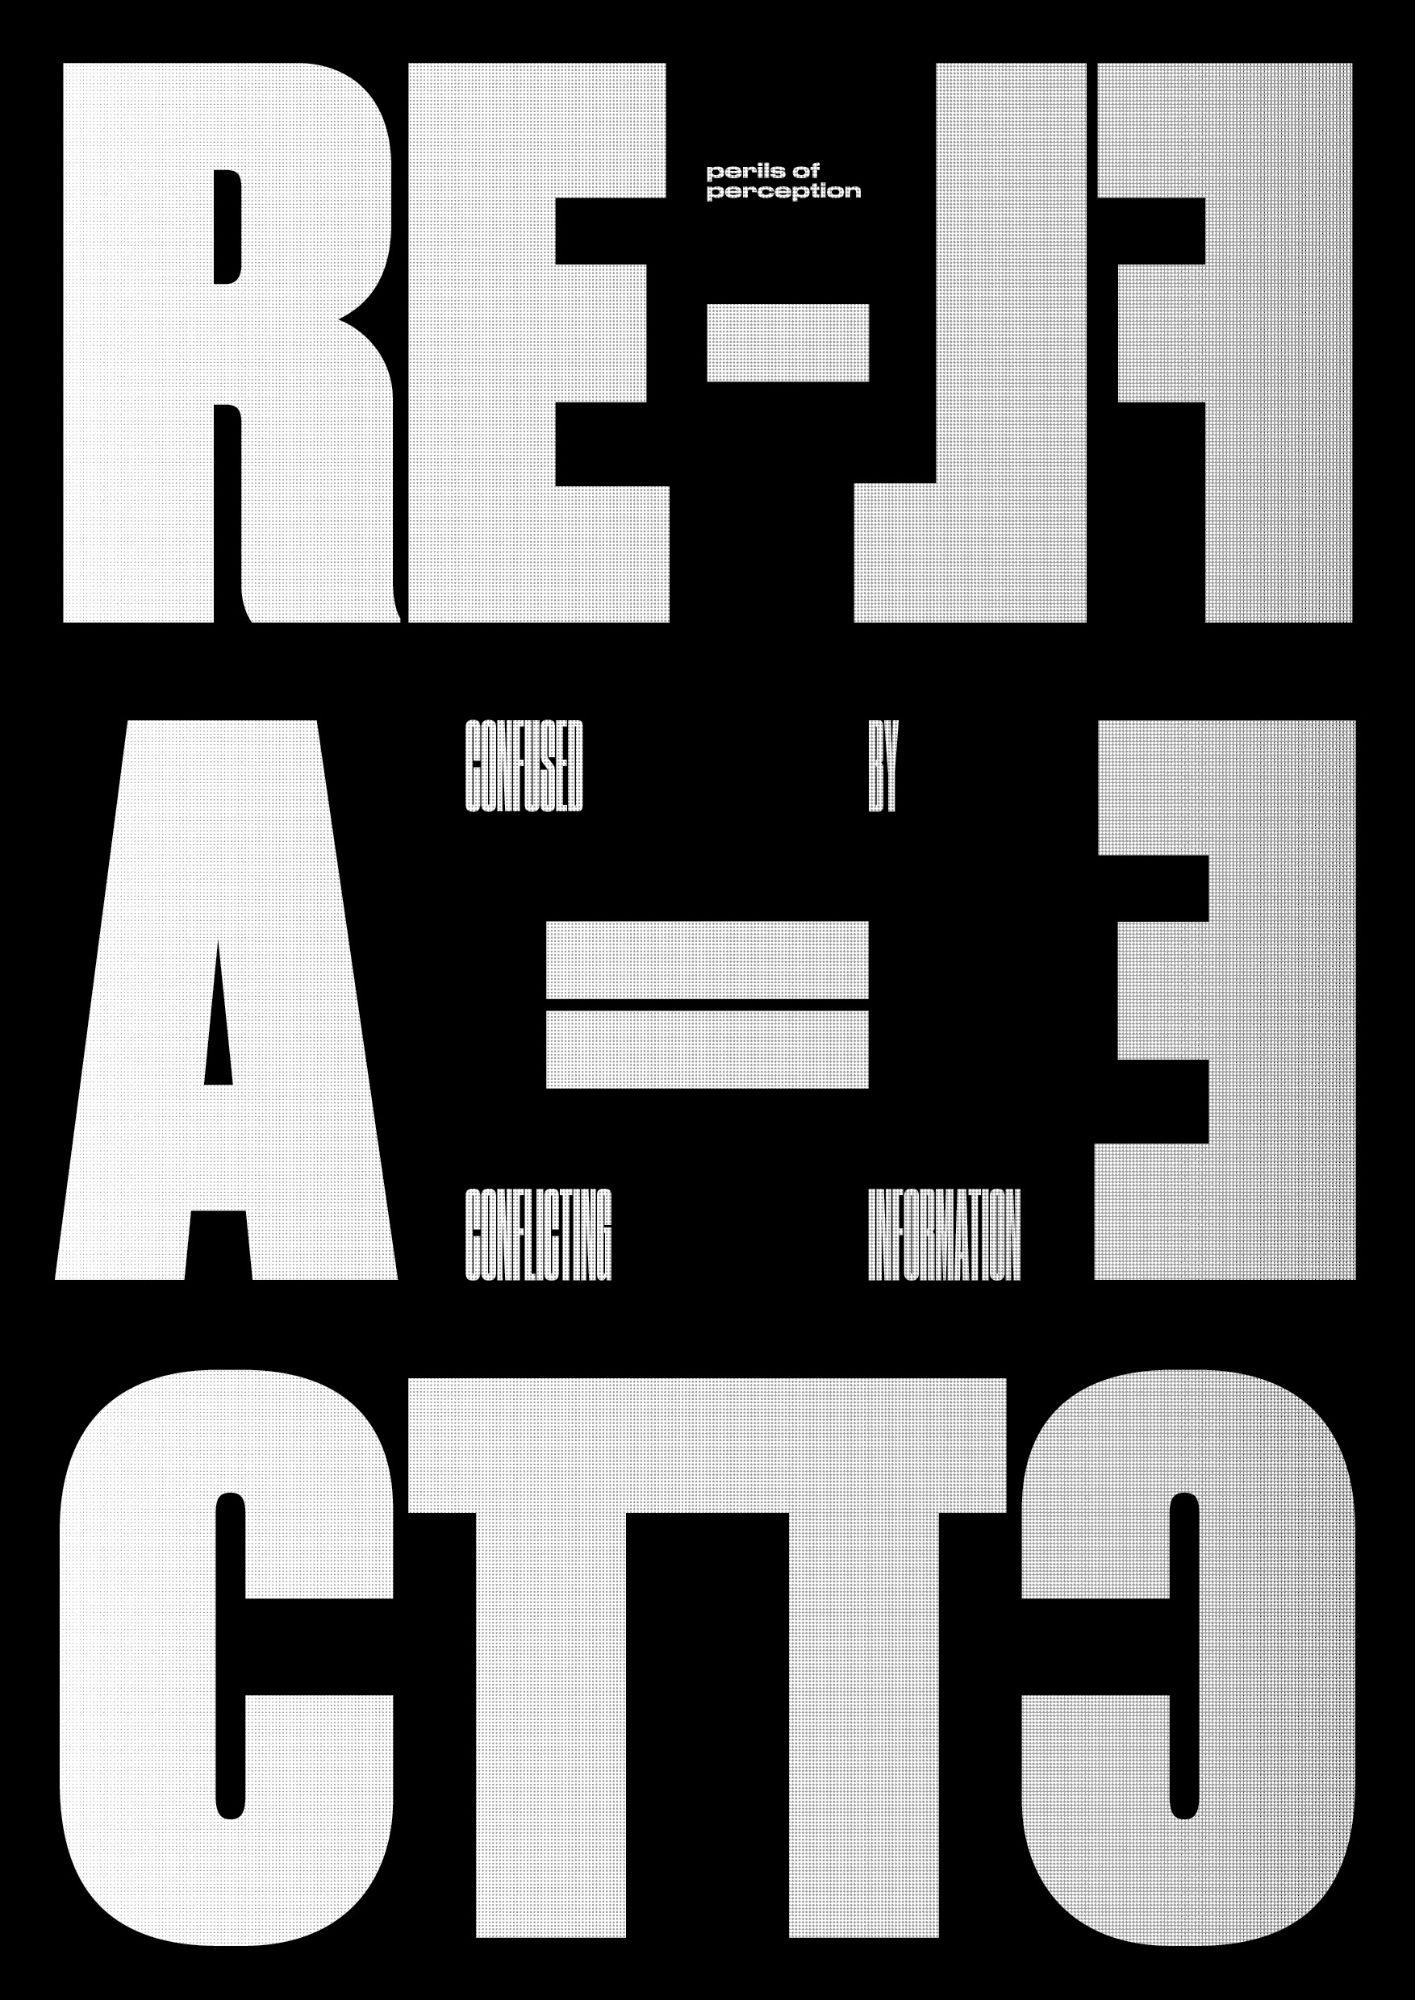 rasmusundchristin-poster-032